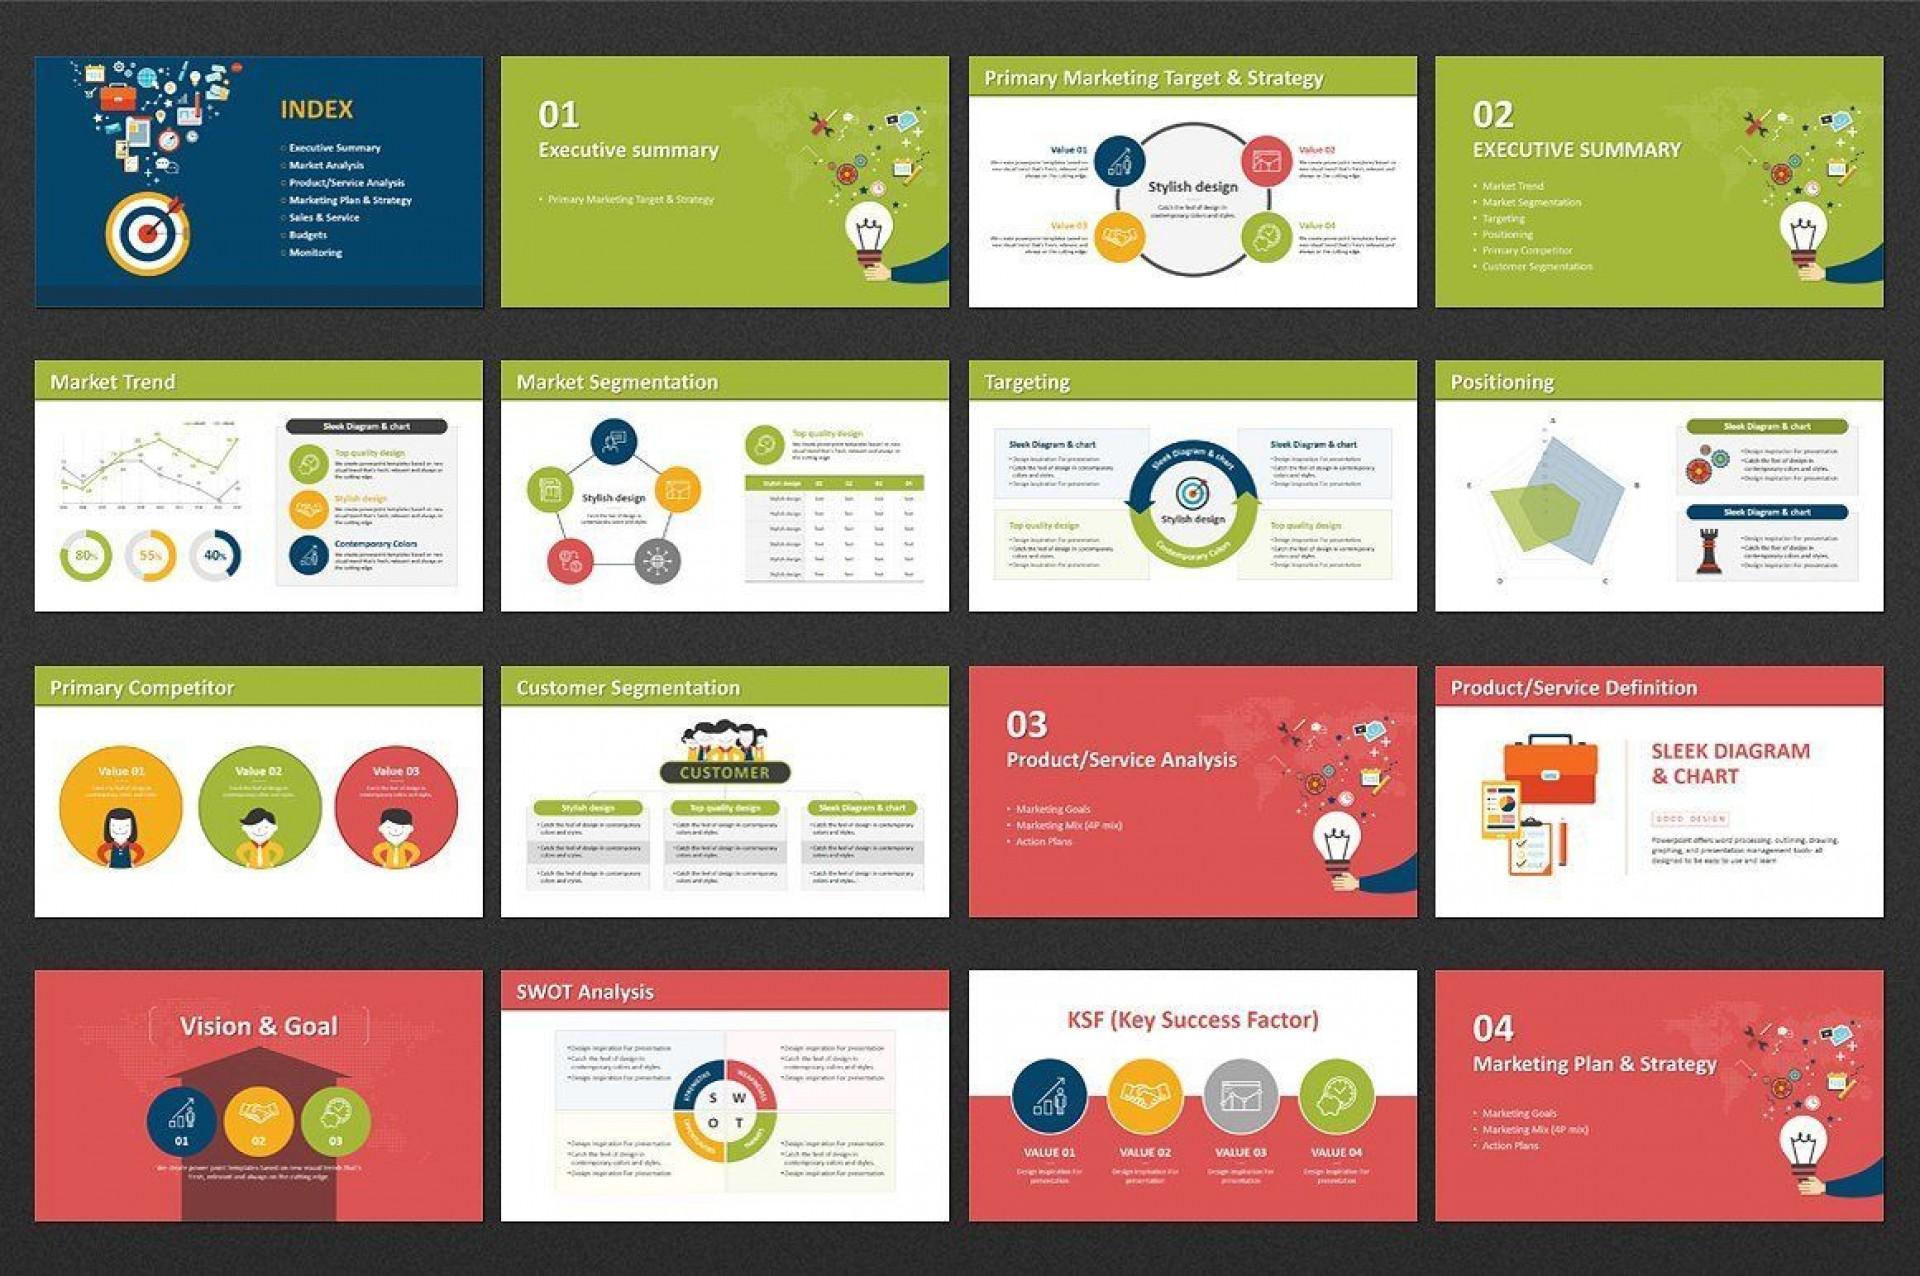 004 Impressive Digital Marketing Plan Template Ppt Inspiration  Presentation Free Slideshare1920